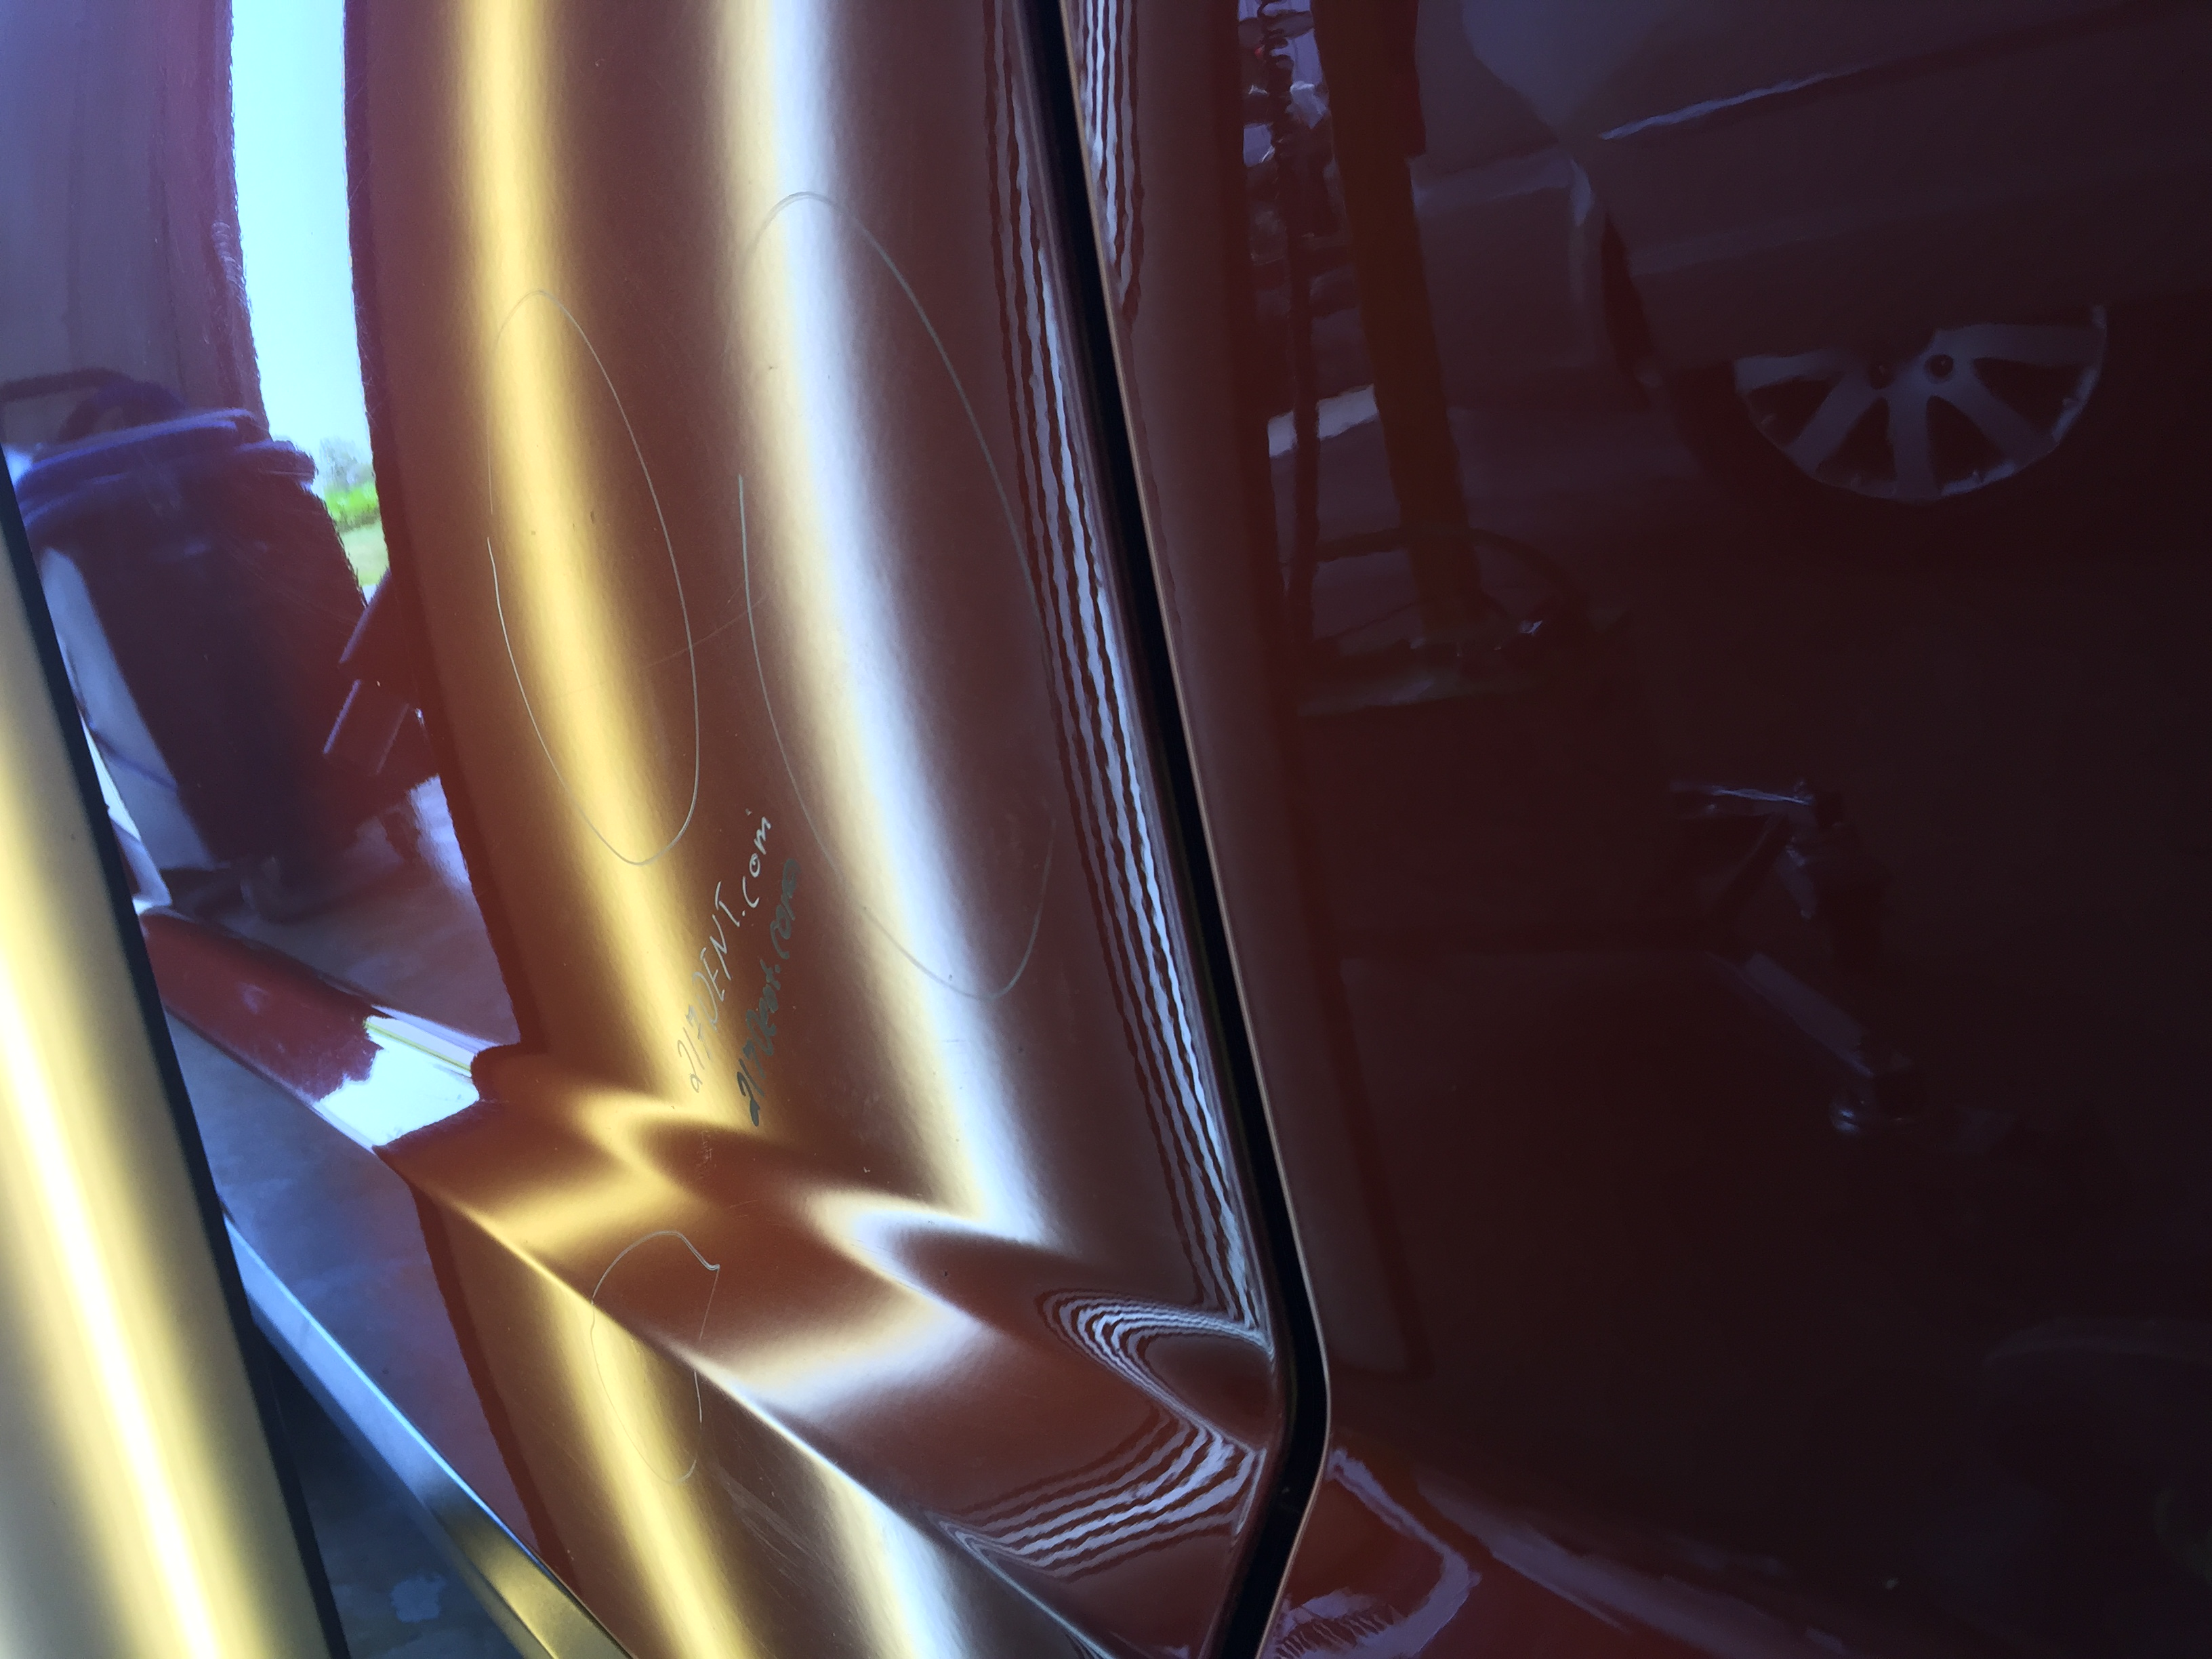 http://217dent.com 2013 Dodge Journey Drivers Door Dent Removal, Springfield Illinois